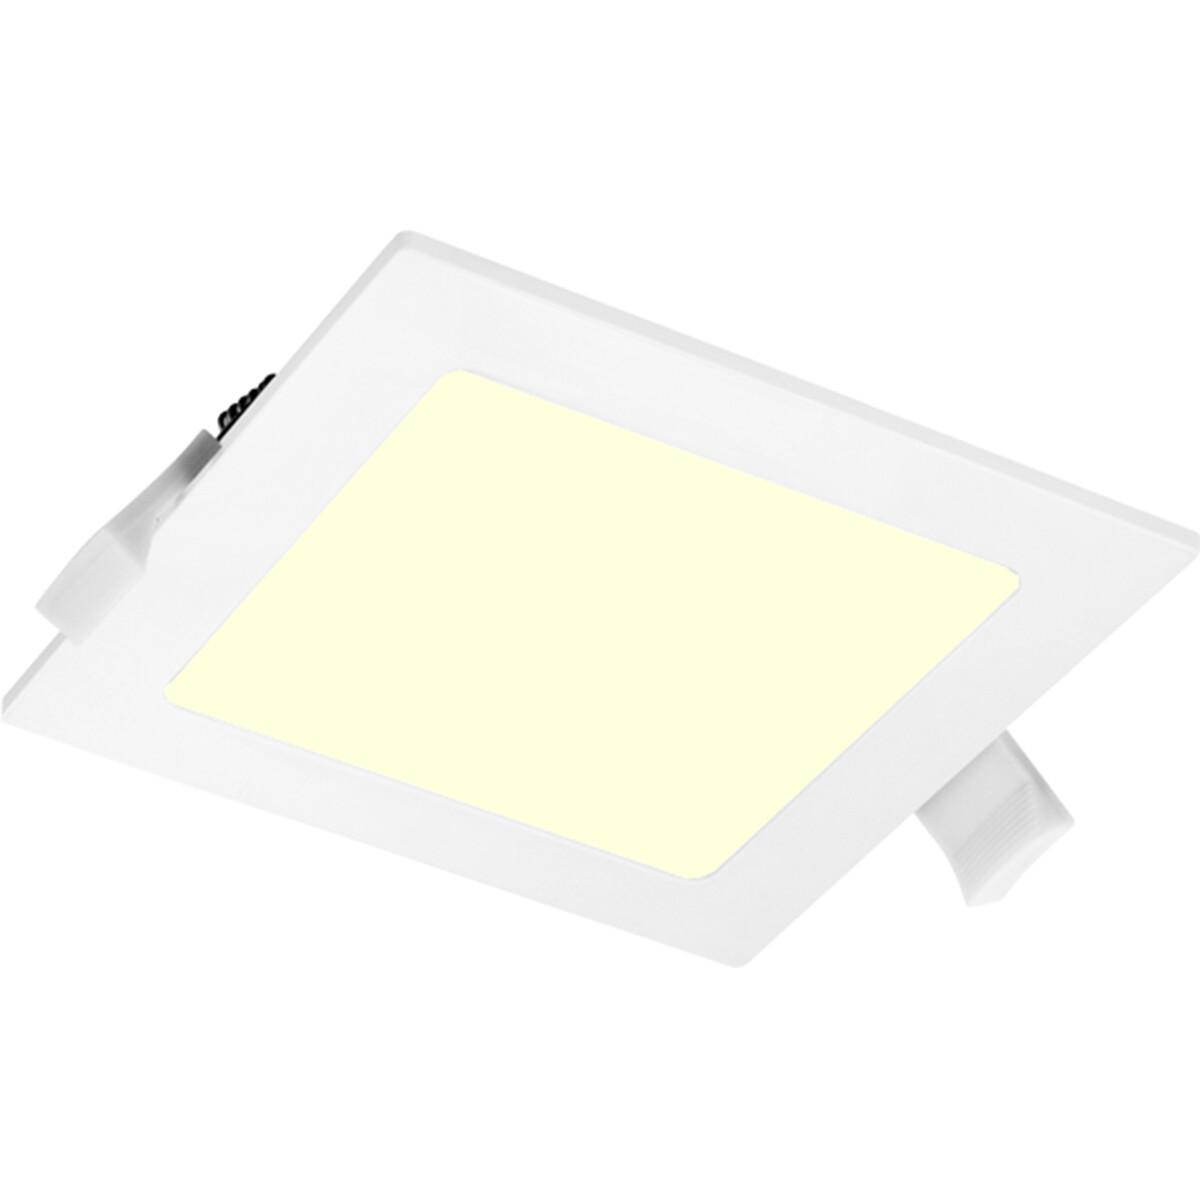 LED Downlight Slim Pro - Aigi Suno - Inbouw Vierkant 12W - Warm Wit 3000K - Mat Wit - Kunststof